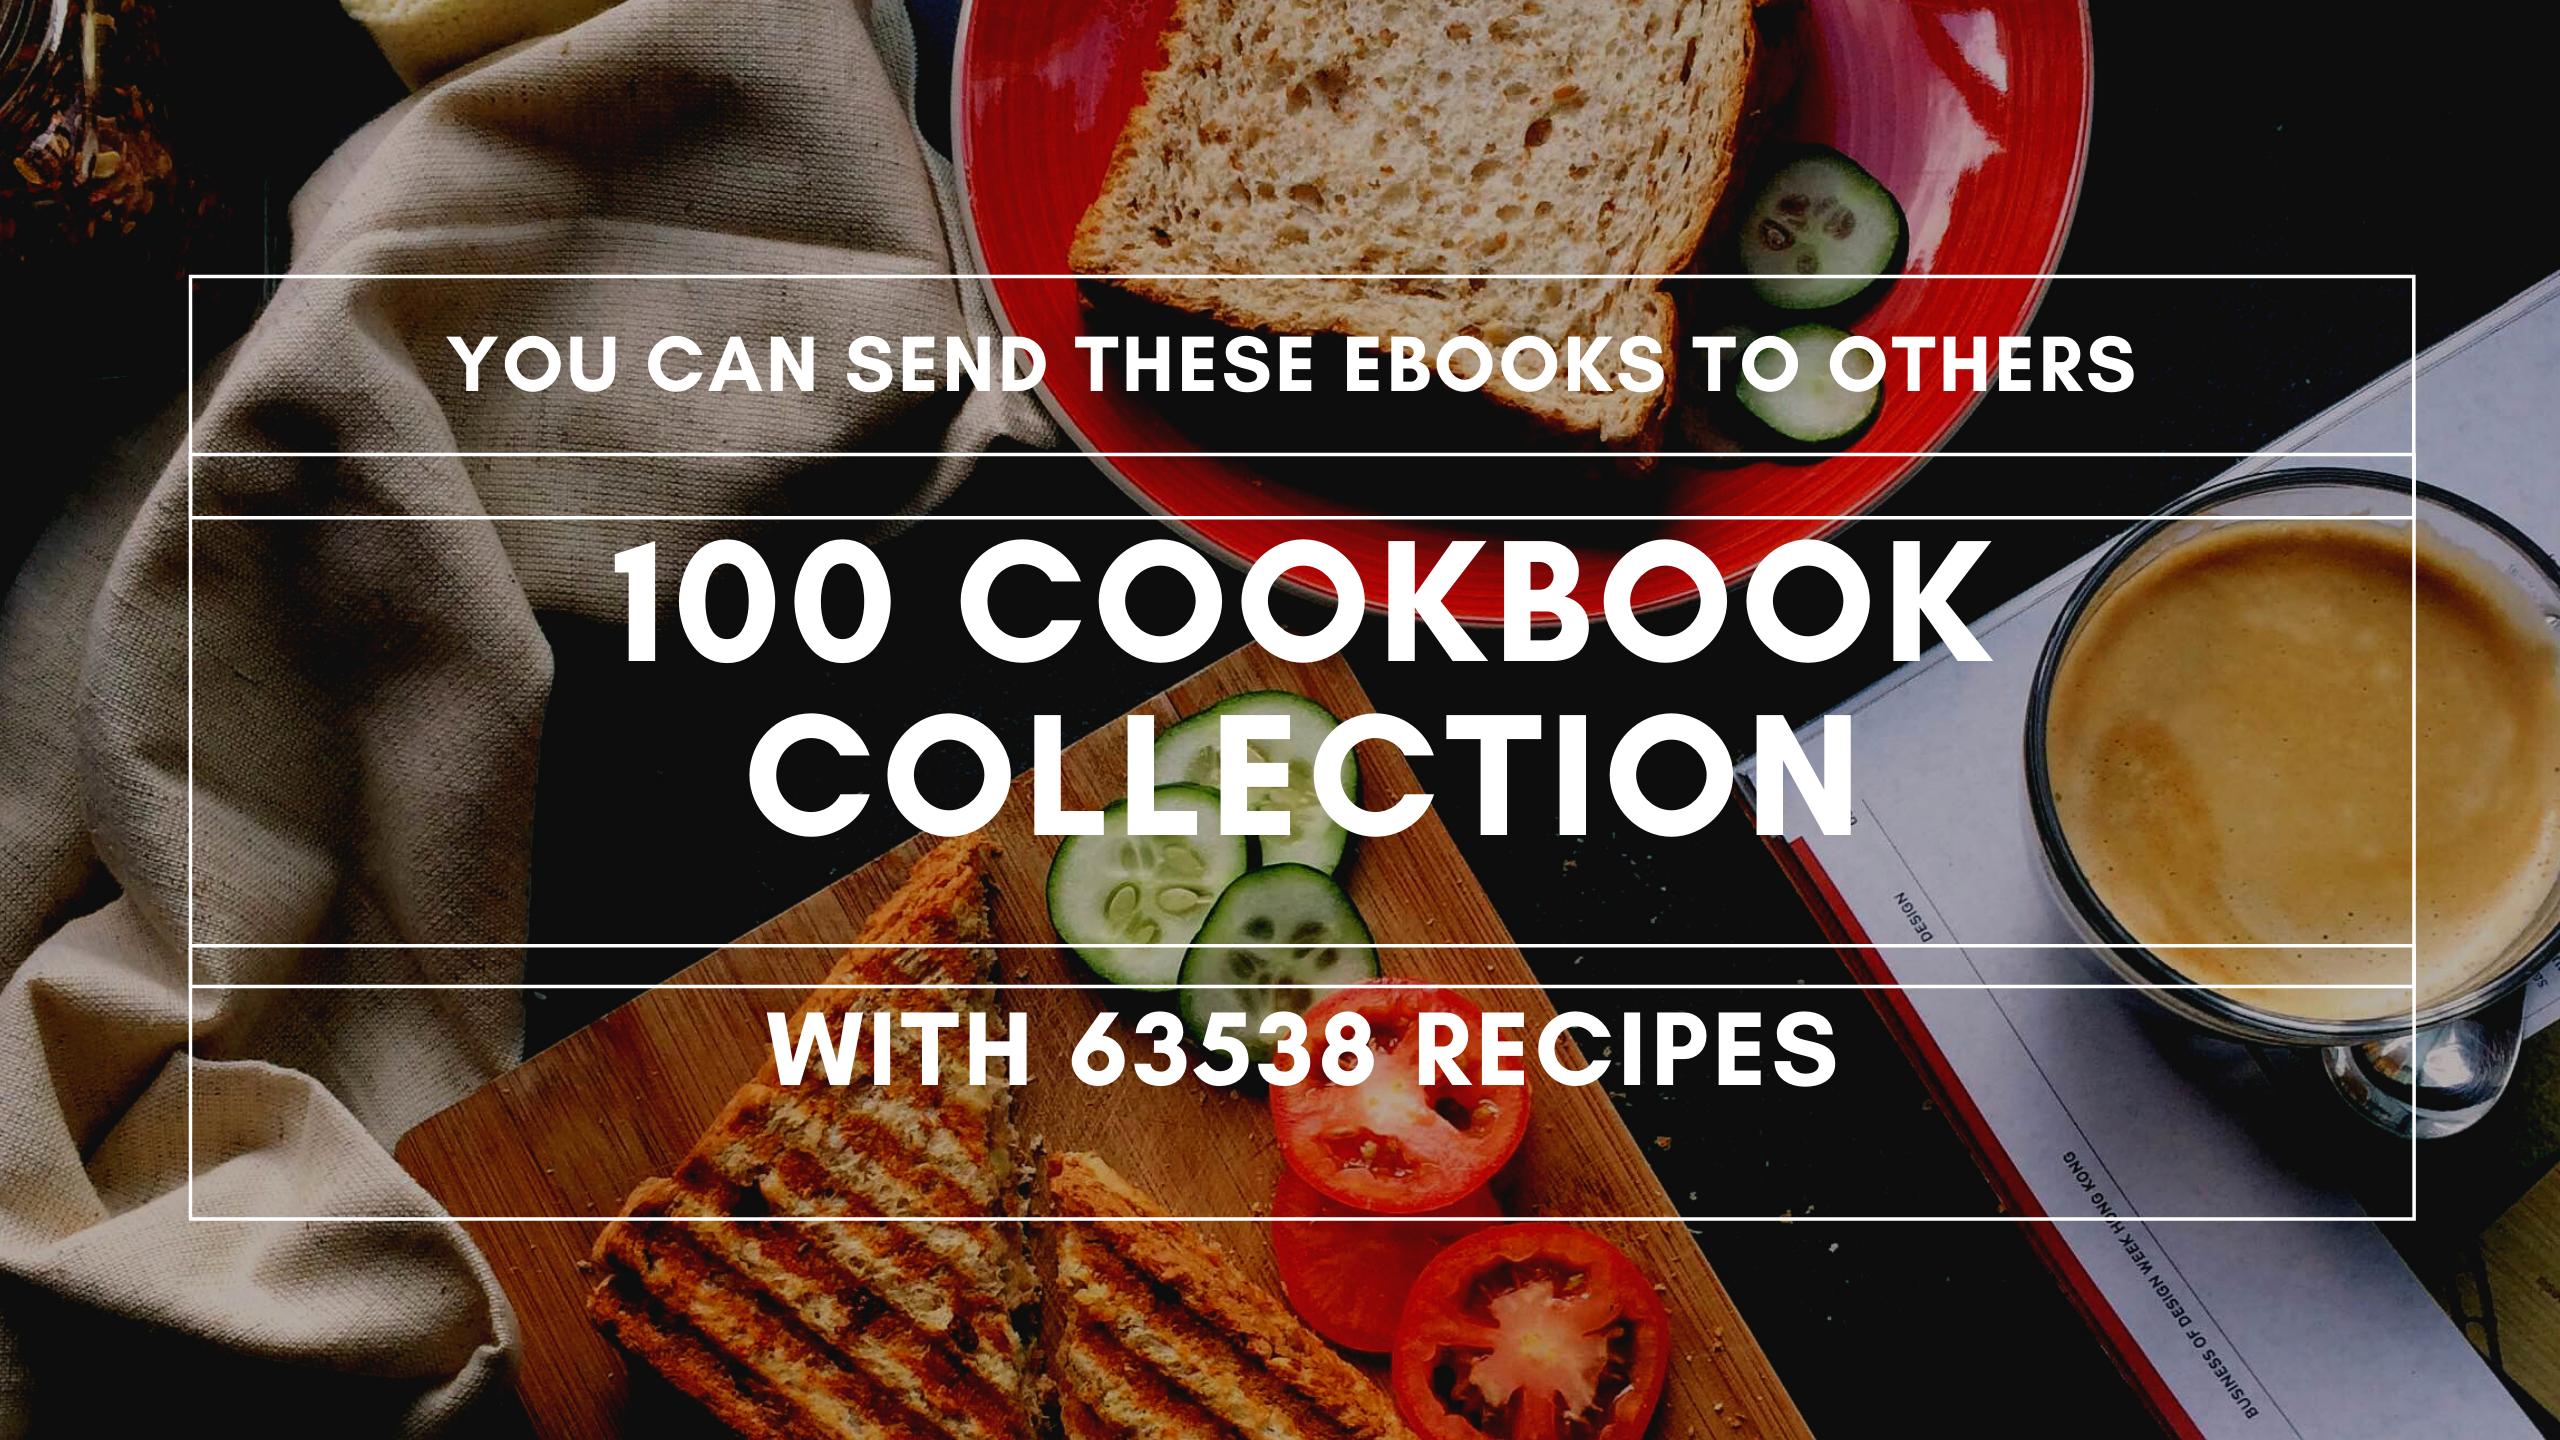 Send you 100 cookbooks with 63538 recipes